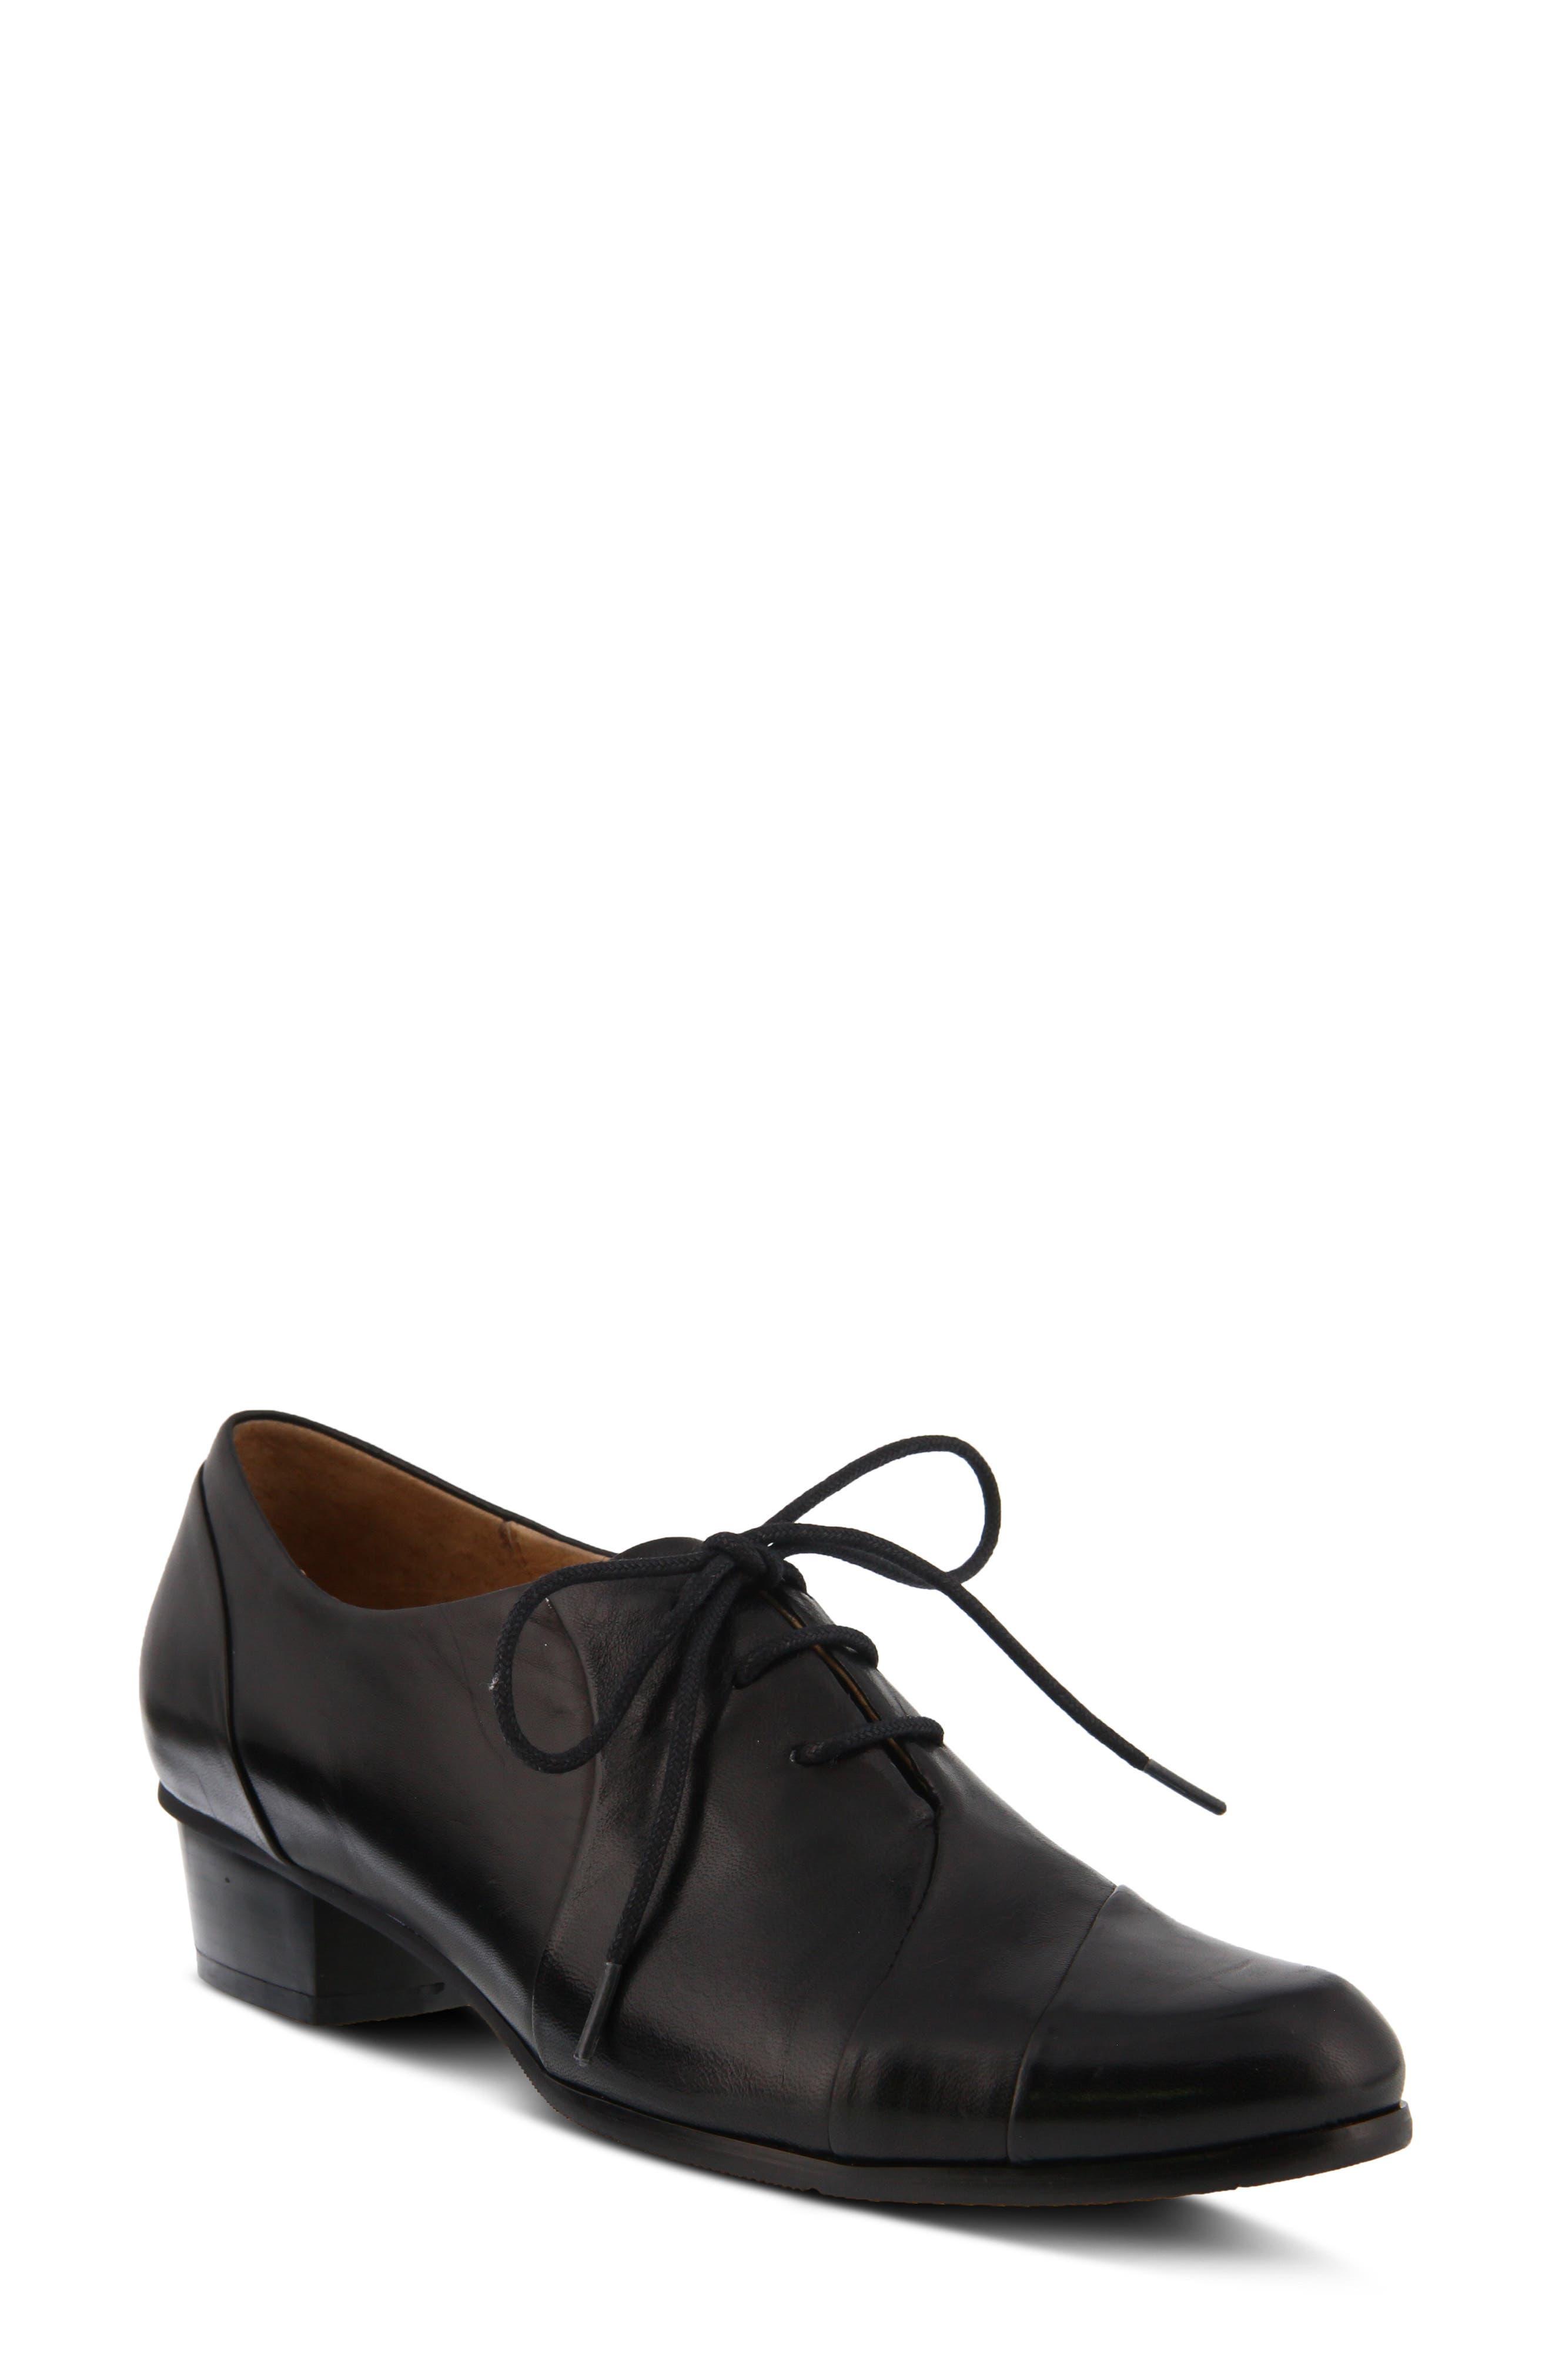 Spring Step Elvera Lace-Up Shoe - Black